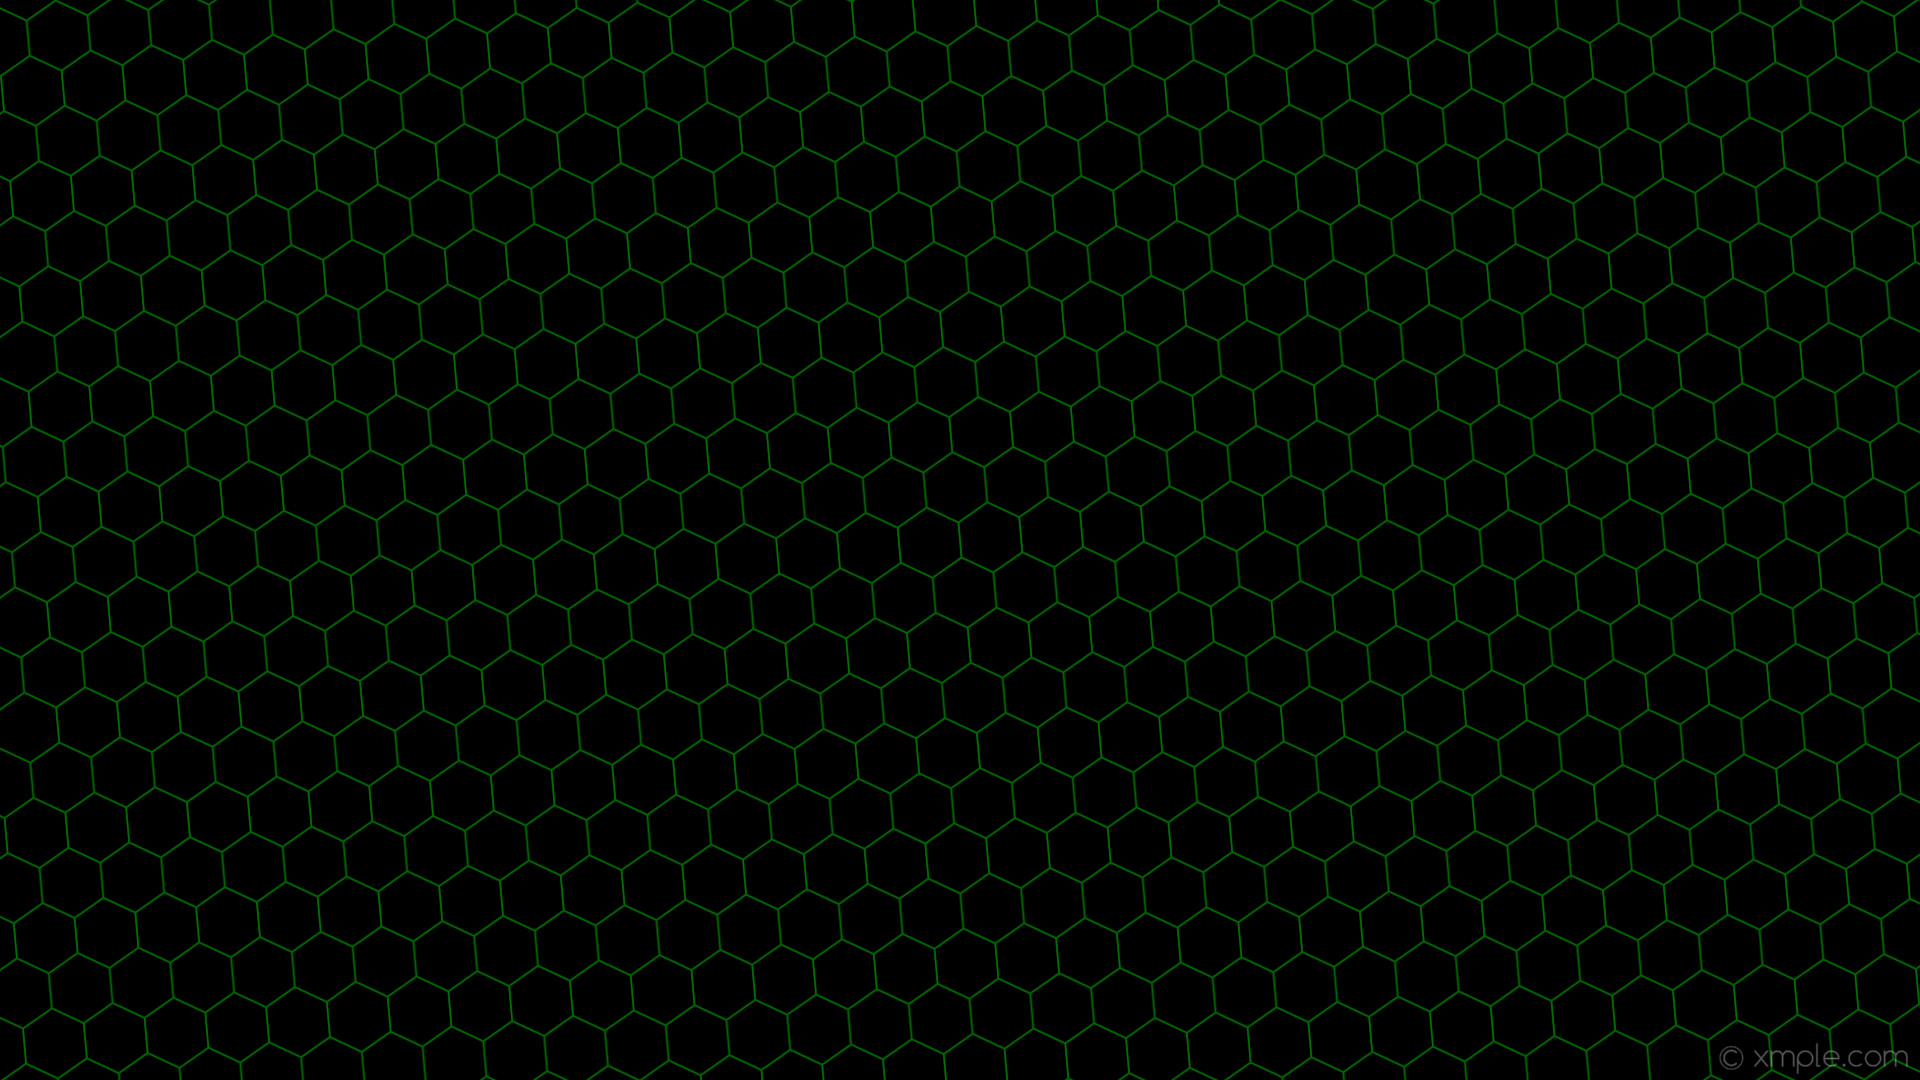 wallpaper honeycomb black green hexagon beehive dark green #000000 #006400  diagonal 5° 2px